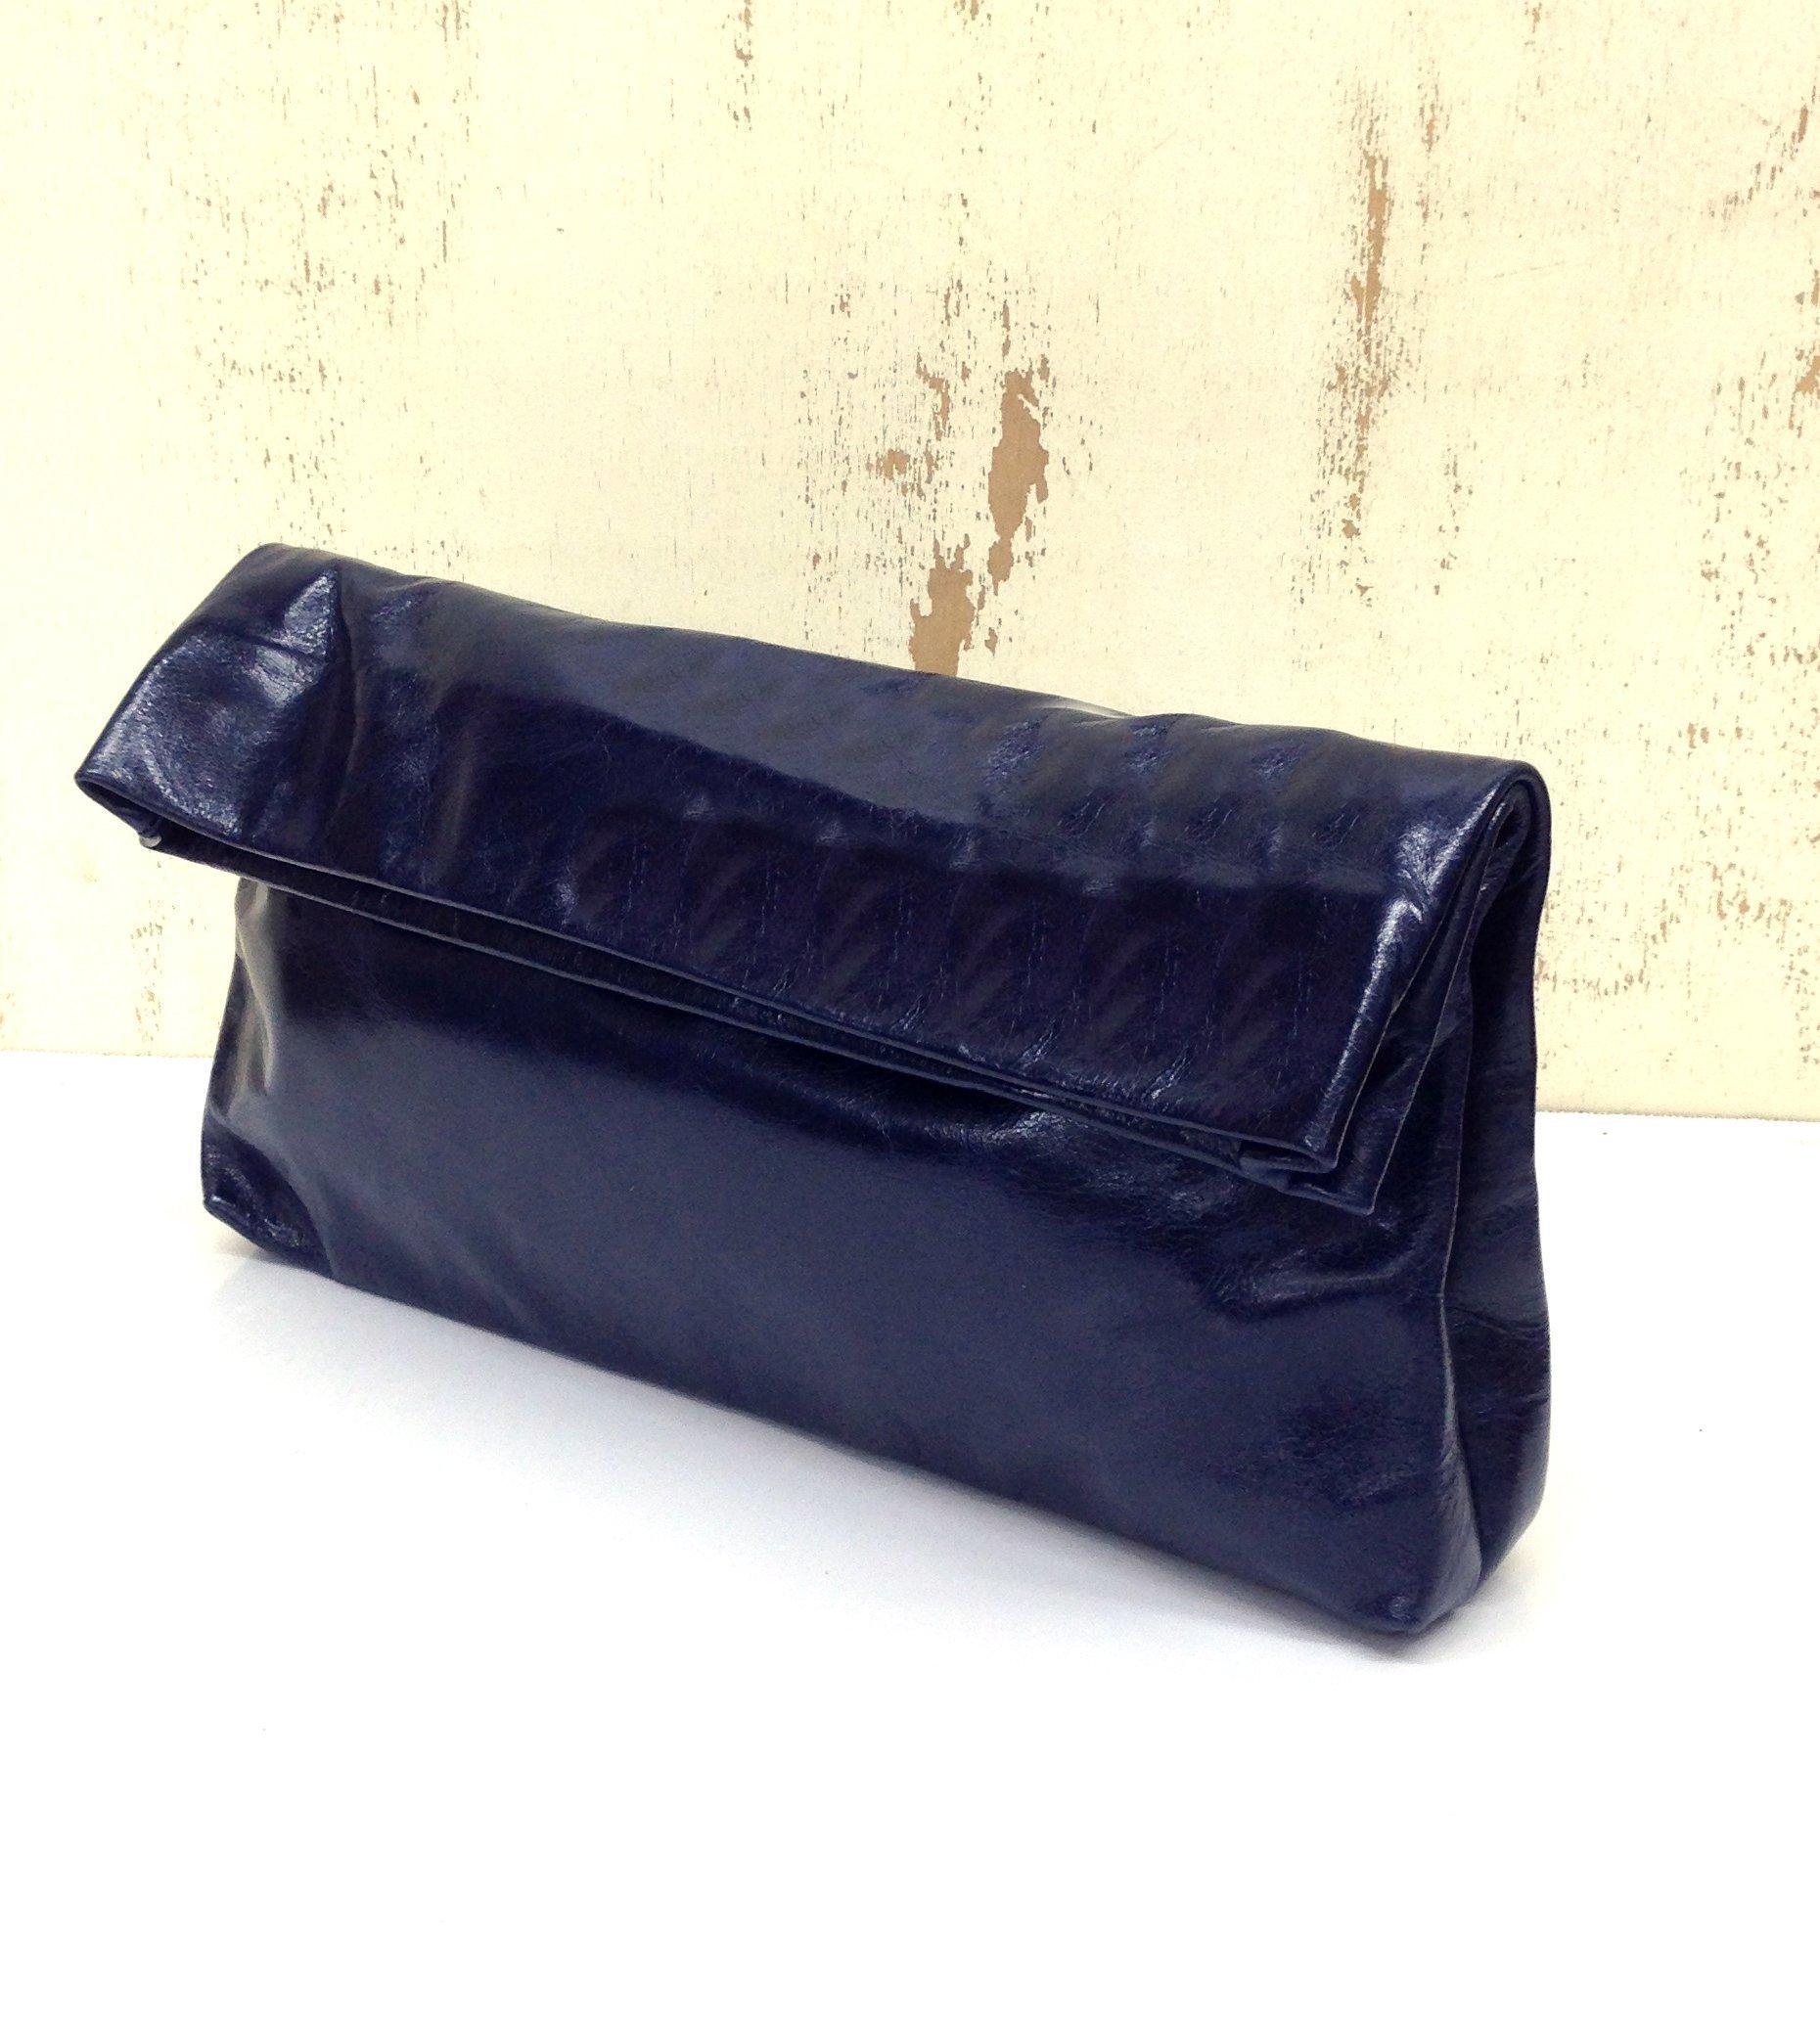 Foldover Glossy Deep Blue Leather Clutch Handbag purse Shoulder handbag Opt: cross body strap